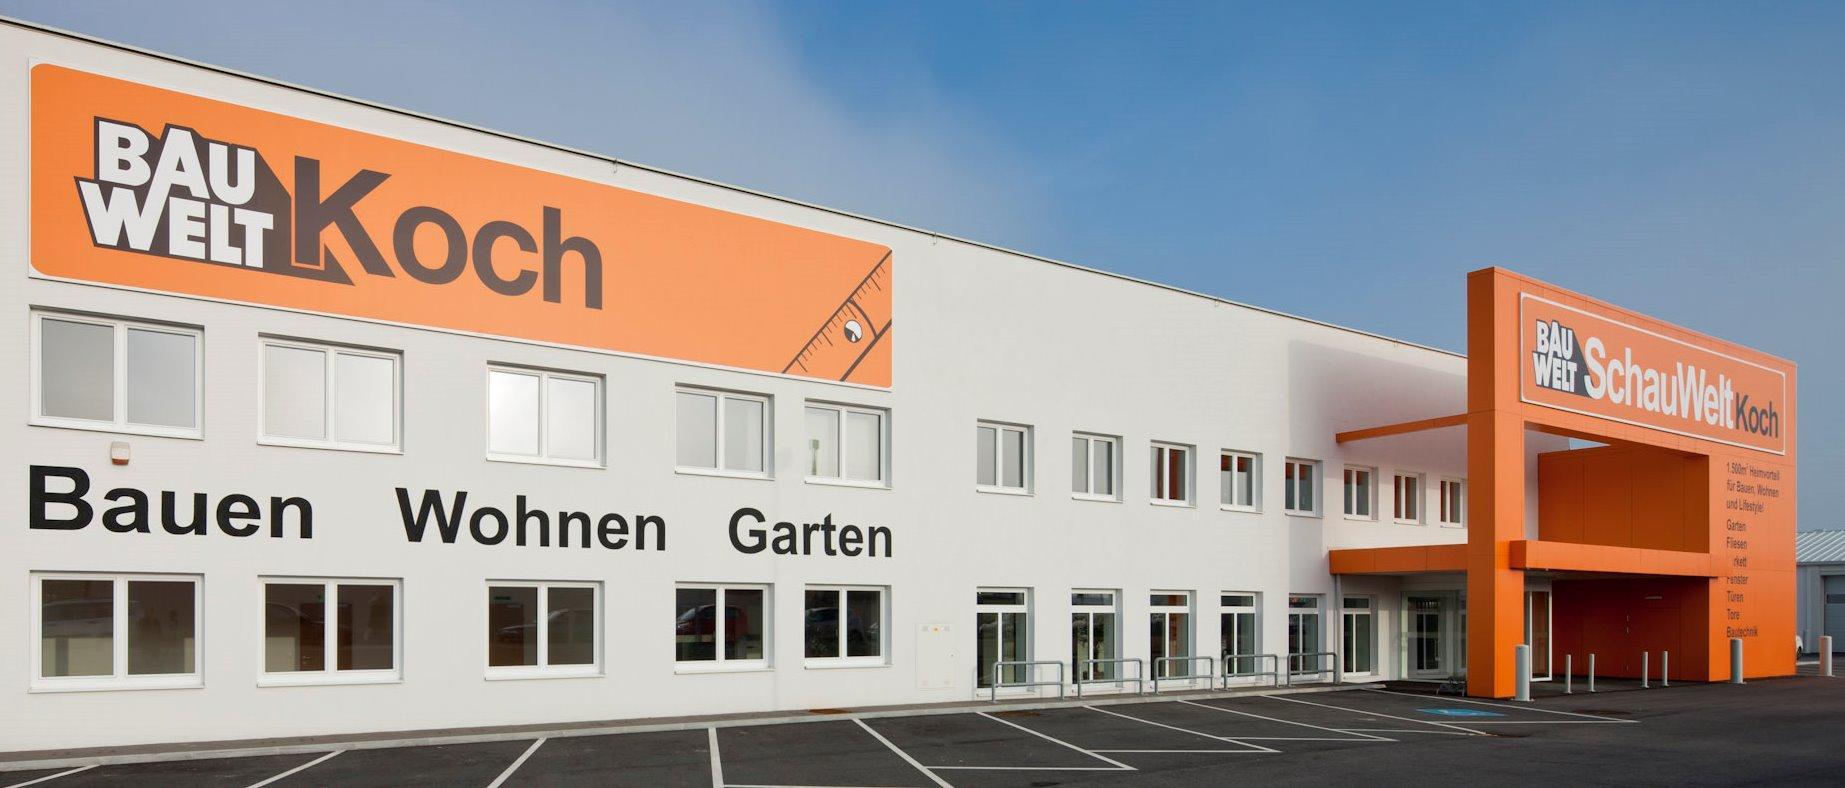 Baustoffgroßhandel Michael Koch Ges.m.b.H. – BauWelt Koch